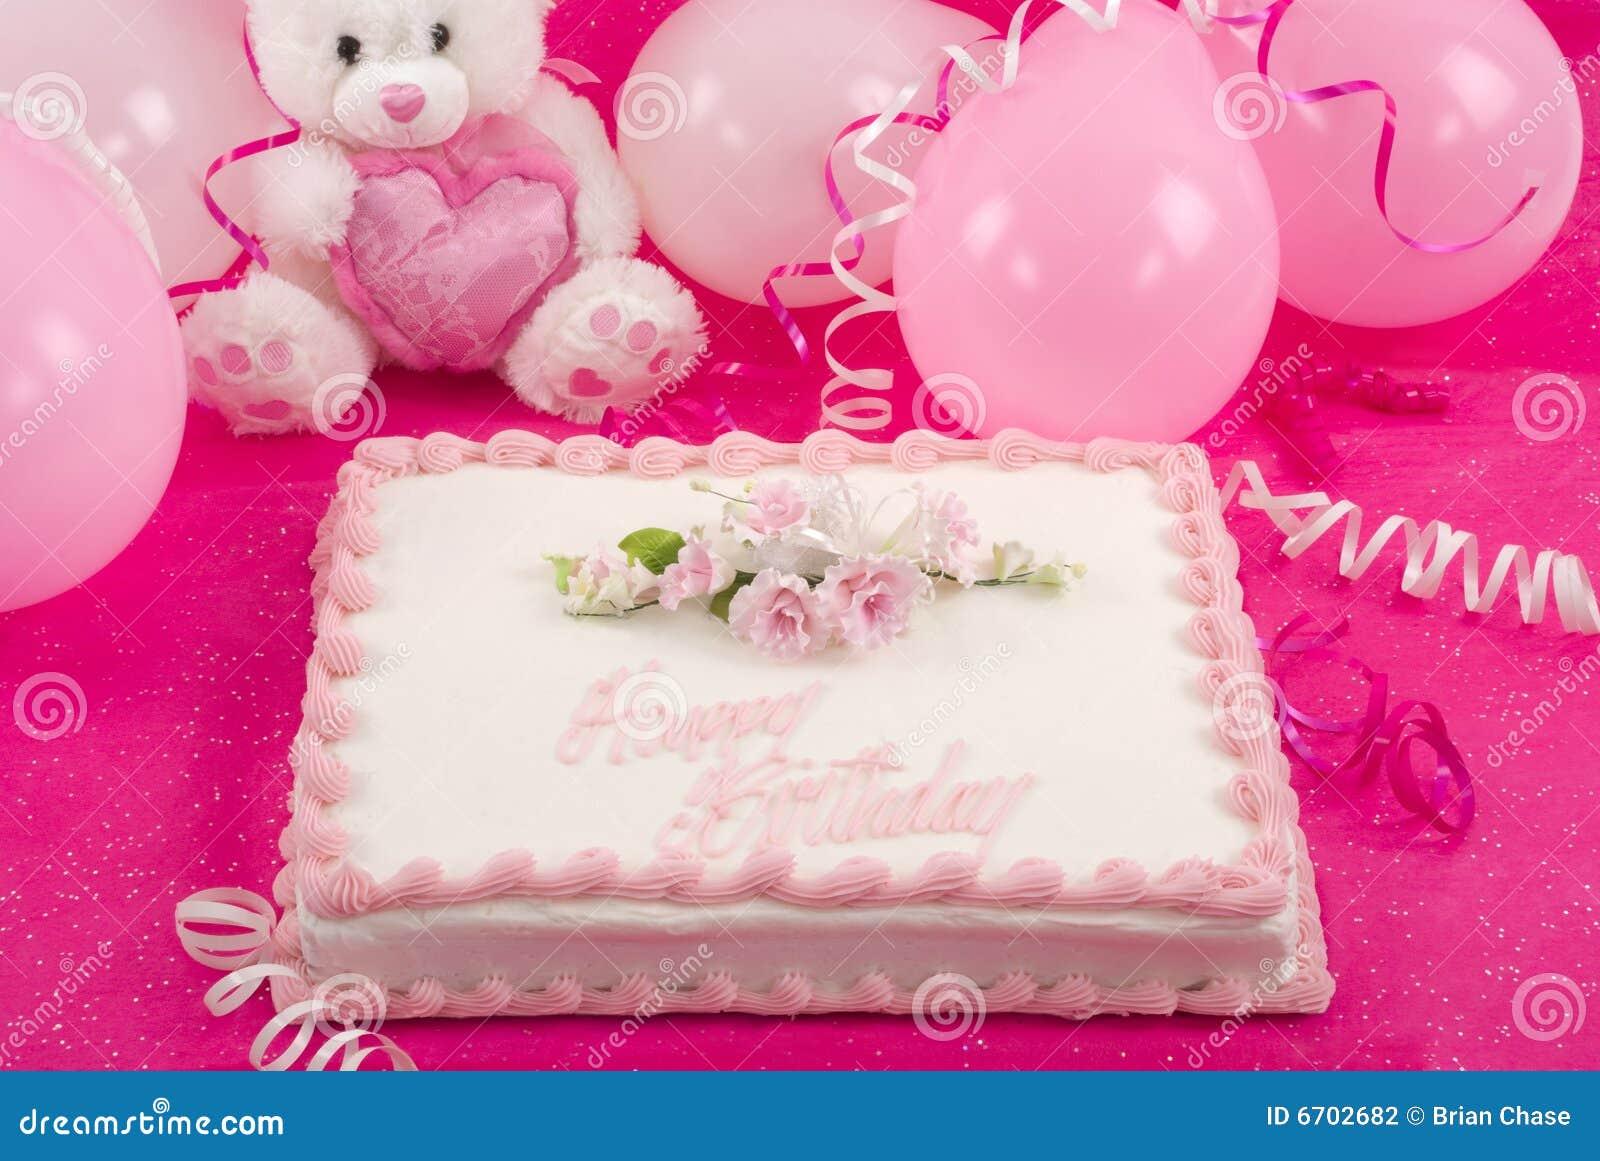 Groovy Birthday Cake Stock Photo Image Of Flower Delicious 6702682 Birthday Cards Printable Nowaargucafe Filternl